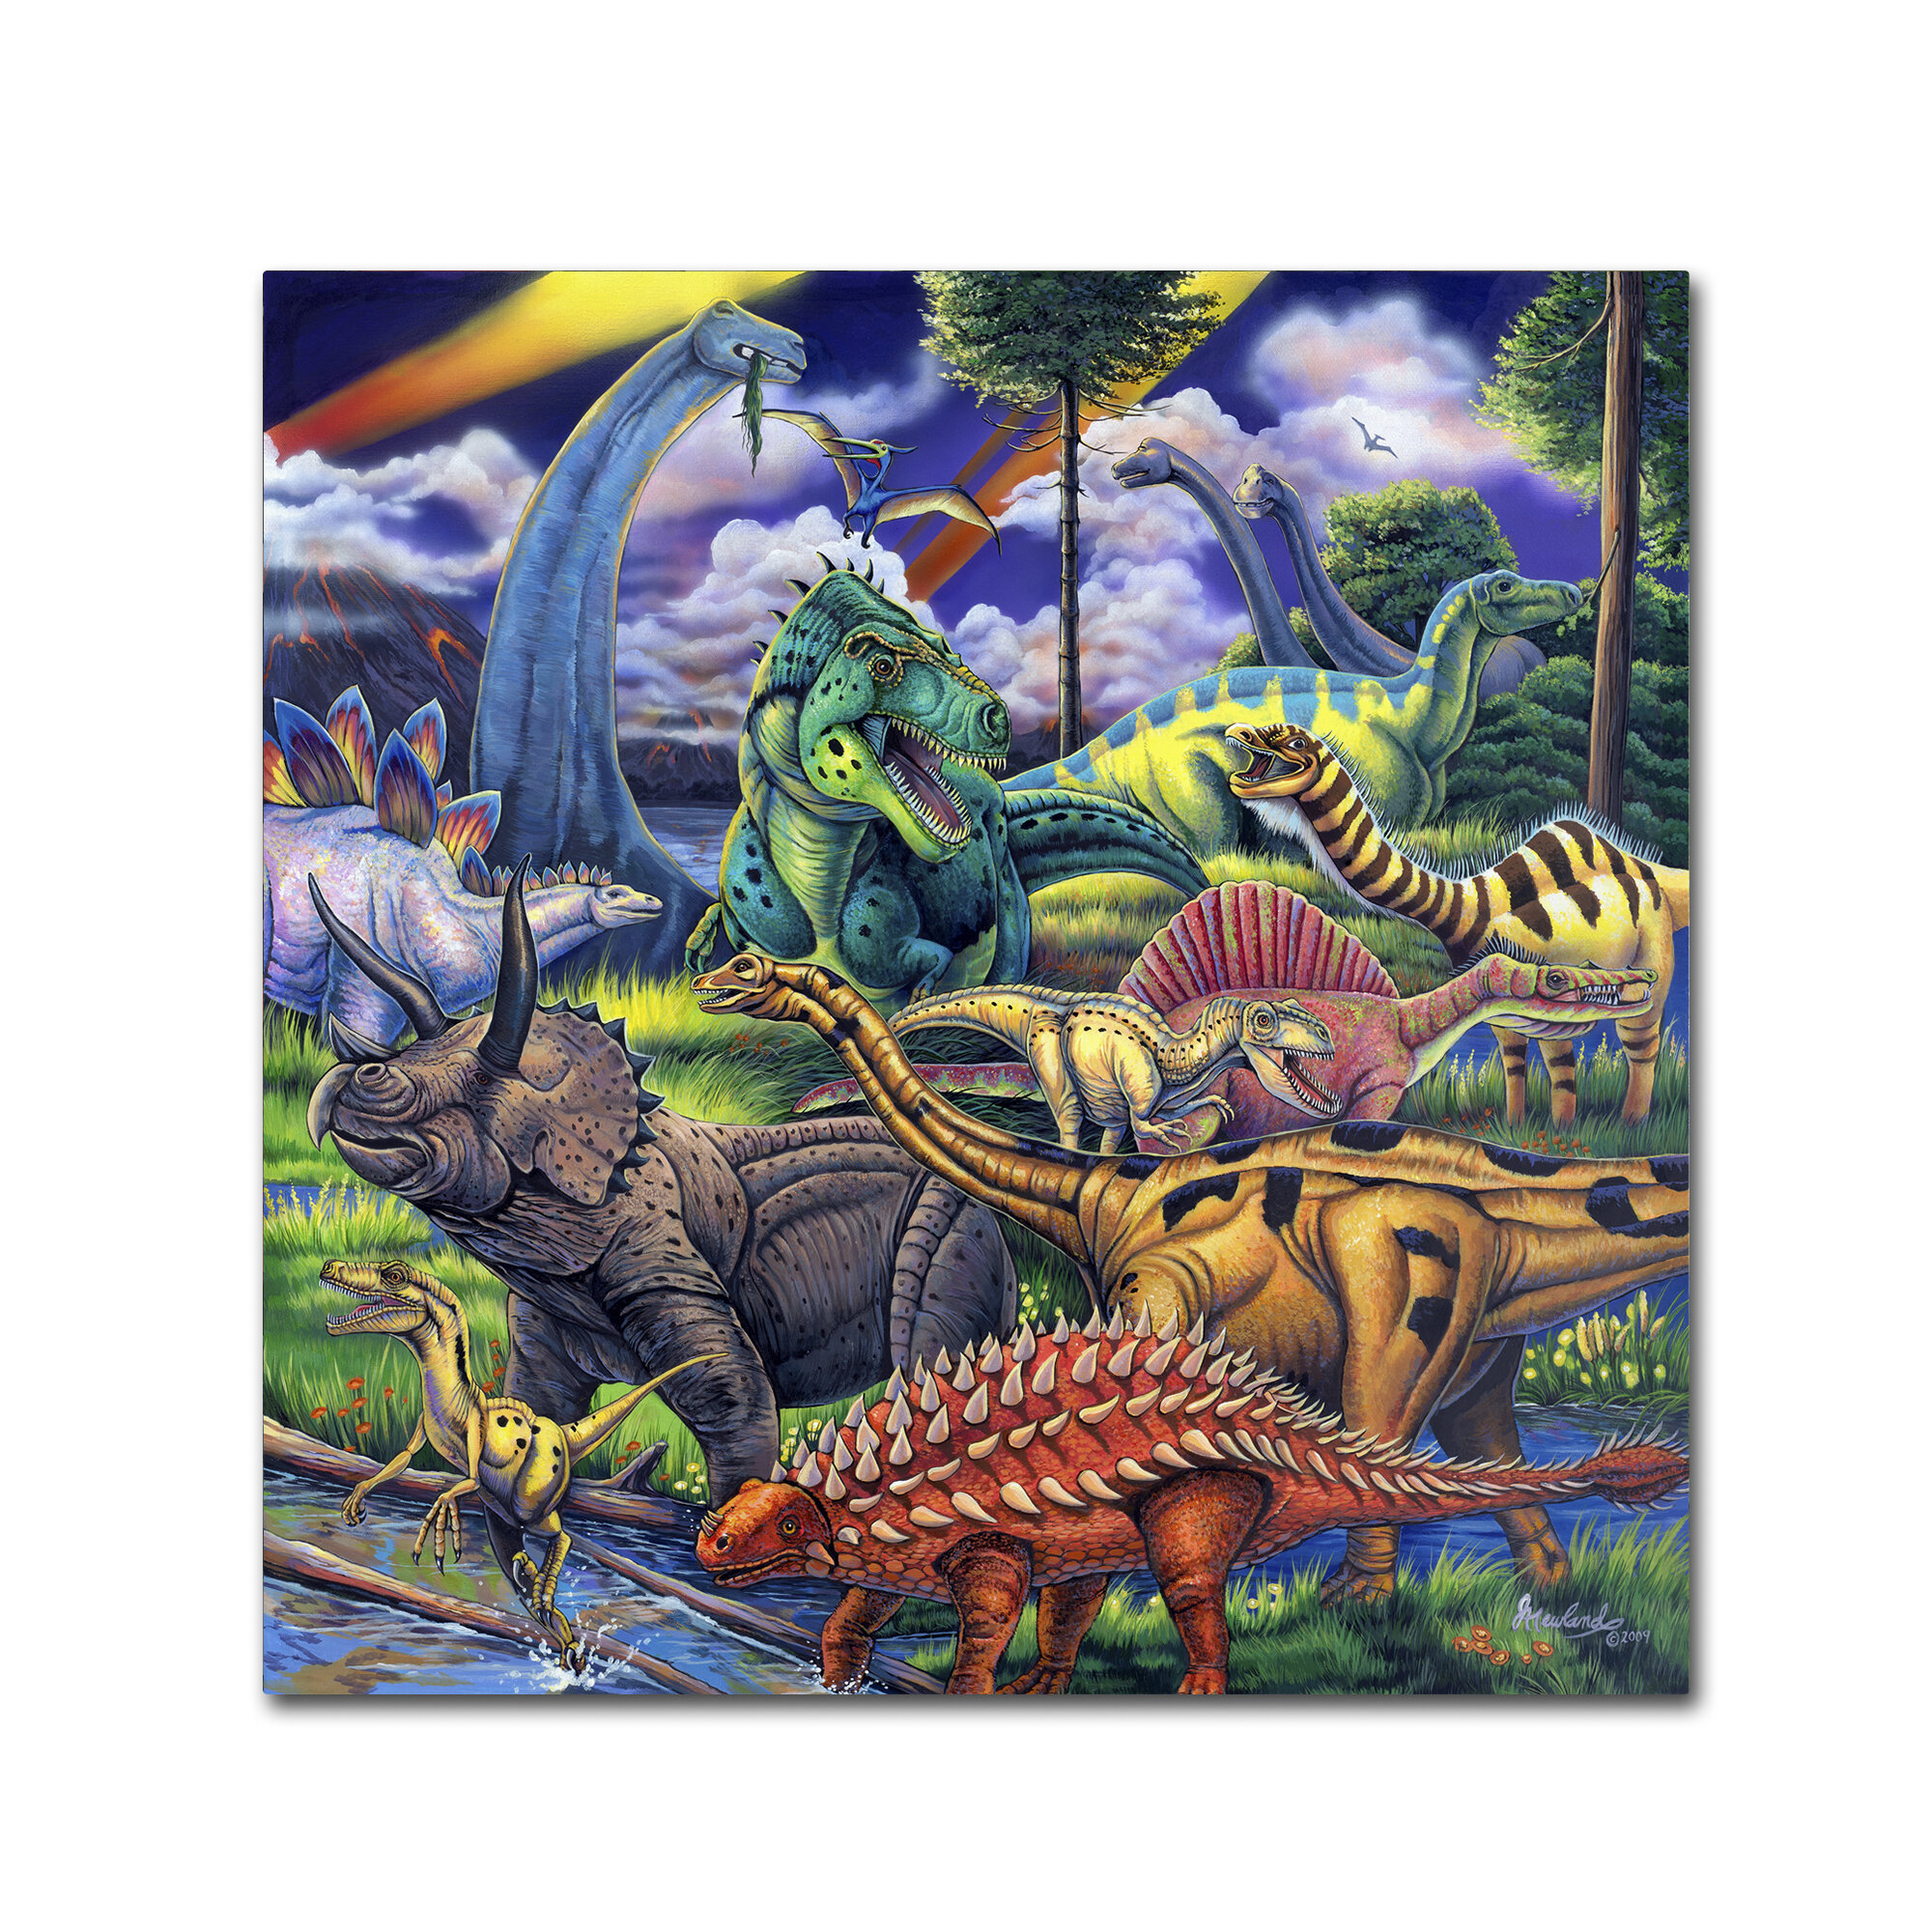 Trademark Art Dinosaur Friends Graphic Art Print On Wrapped Canvas Reviews Wayfair